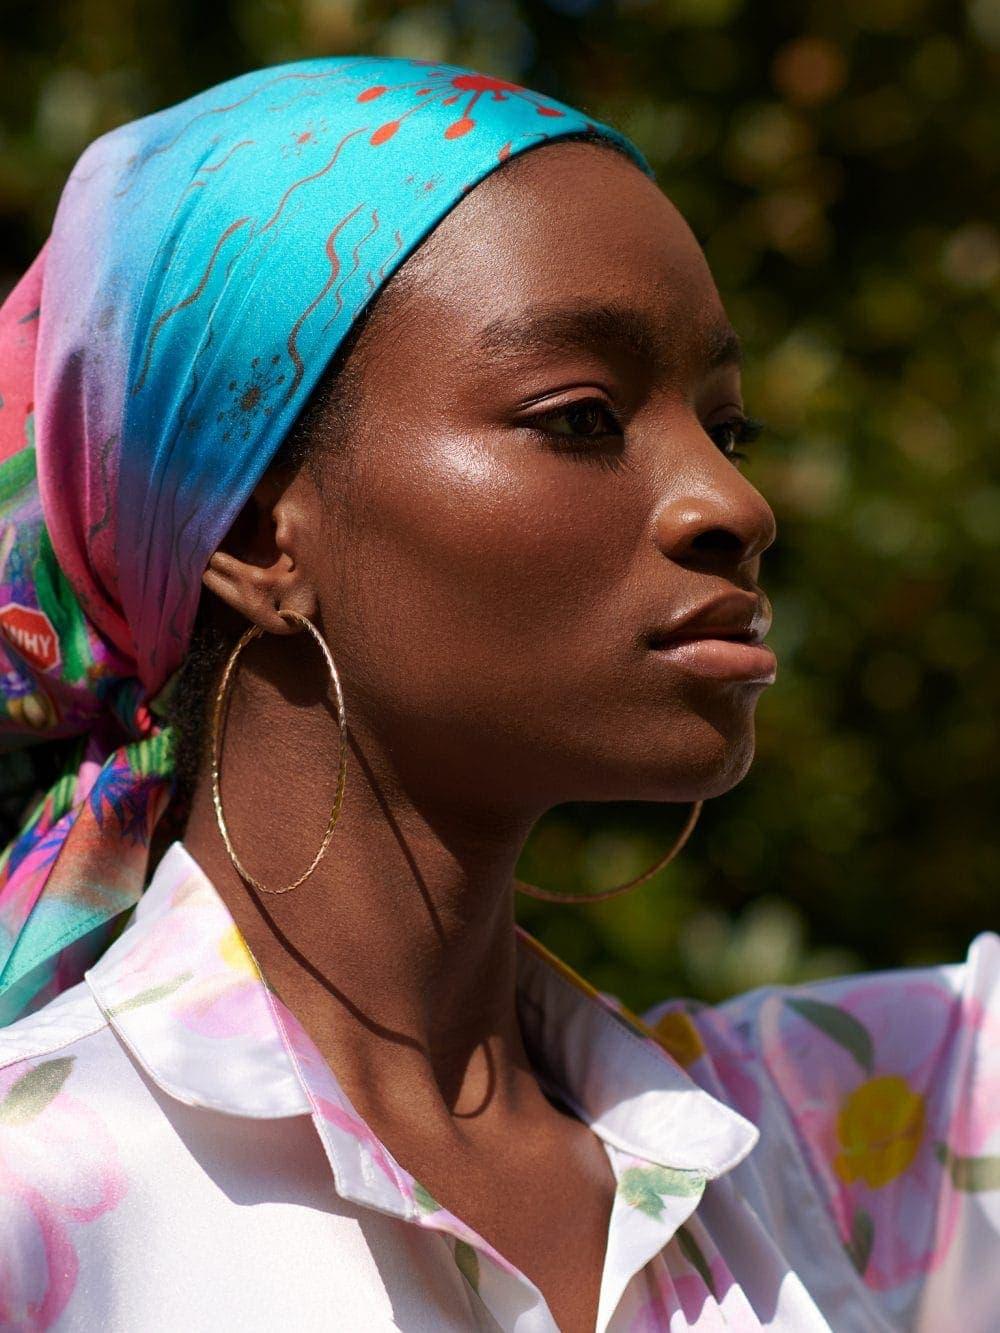 beautiful portrait of stunning dark skinned model wearing vibrant head scarf